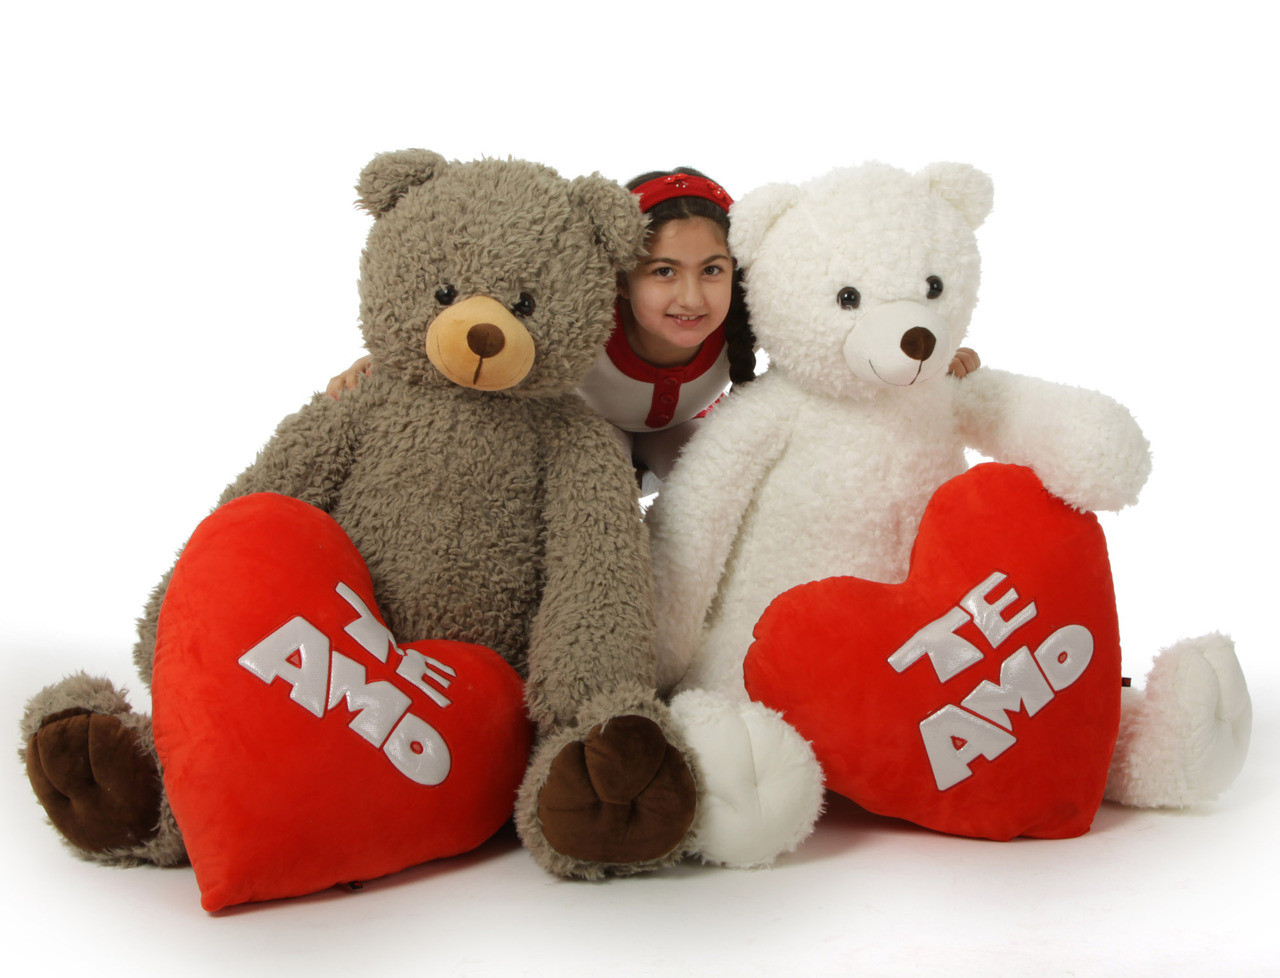 Te Amo! Huge 42in Valentine's Day Teddy Bears, Bell (white) Max (khaki)